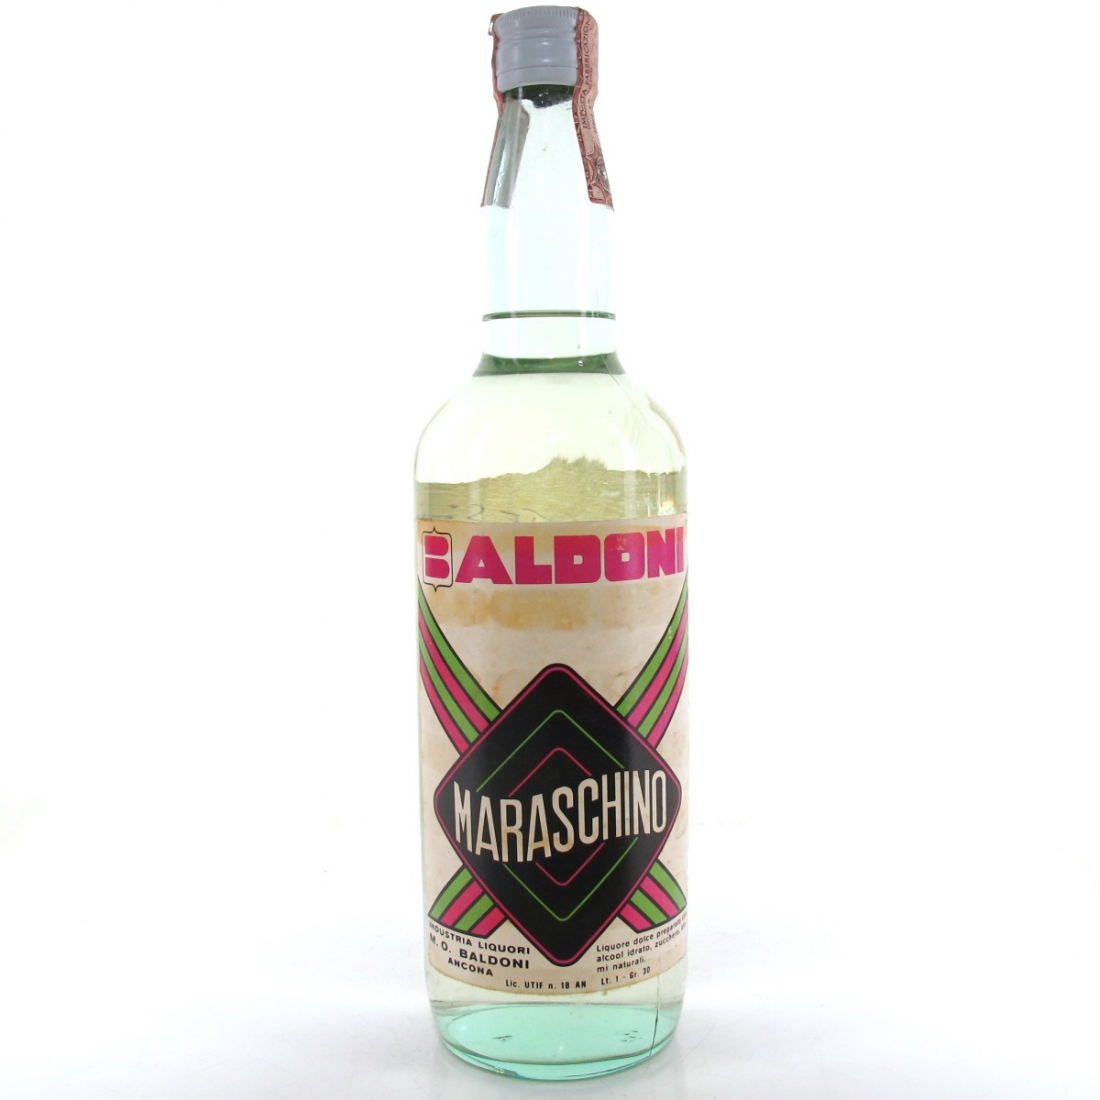 Baldoni Maraschino Liquore 1 Litre Circa 1970s